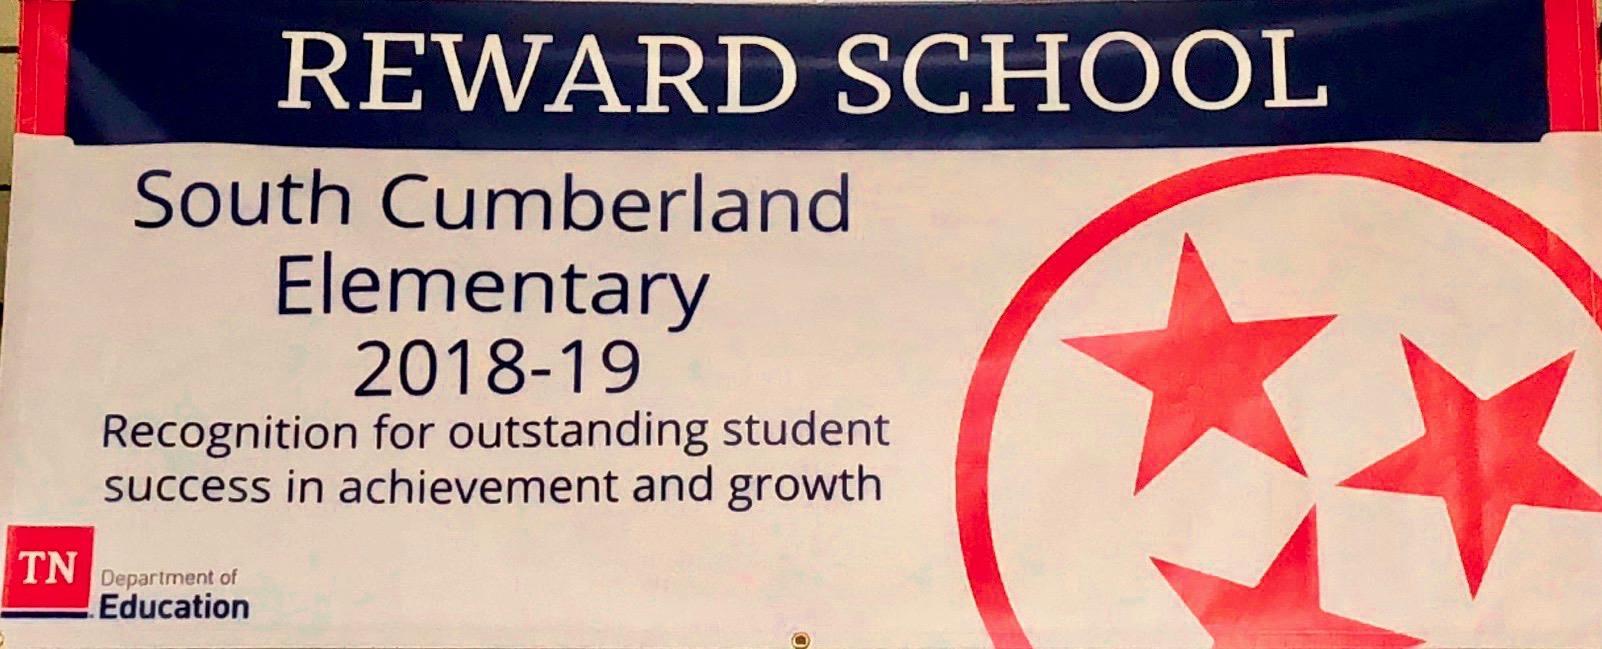 Award School